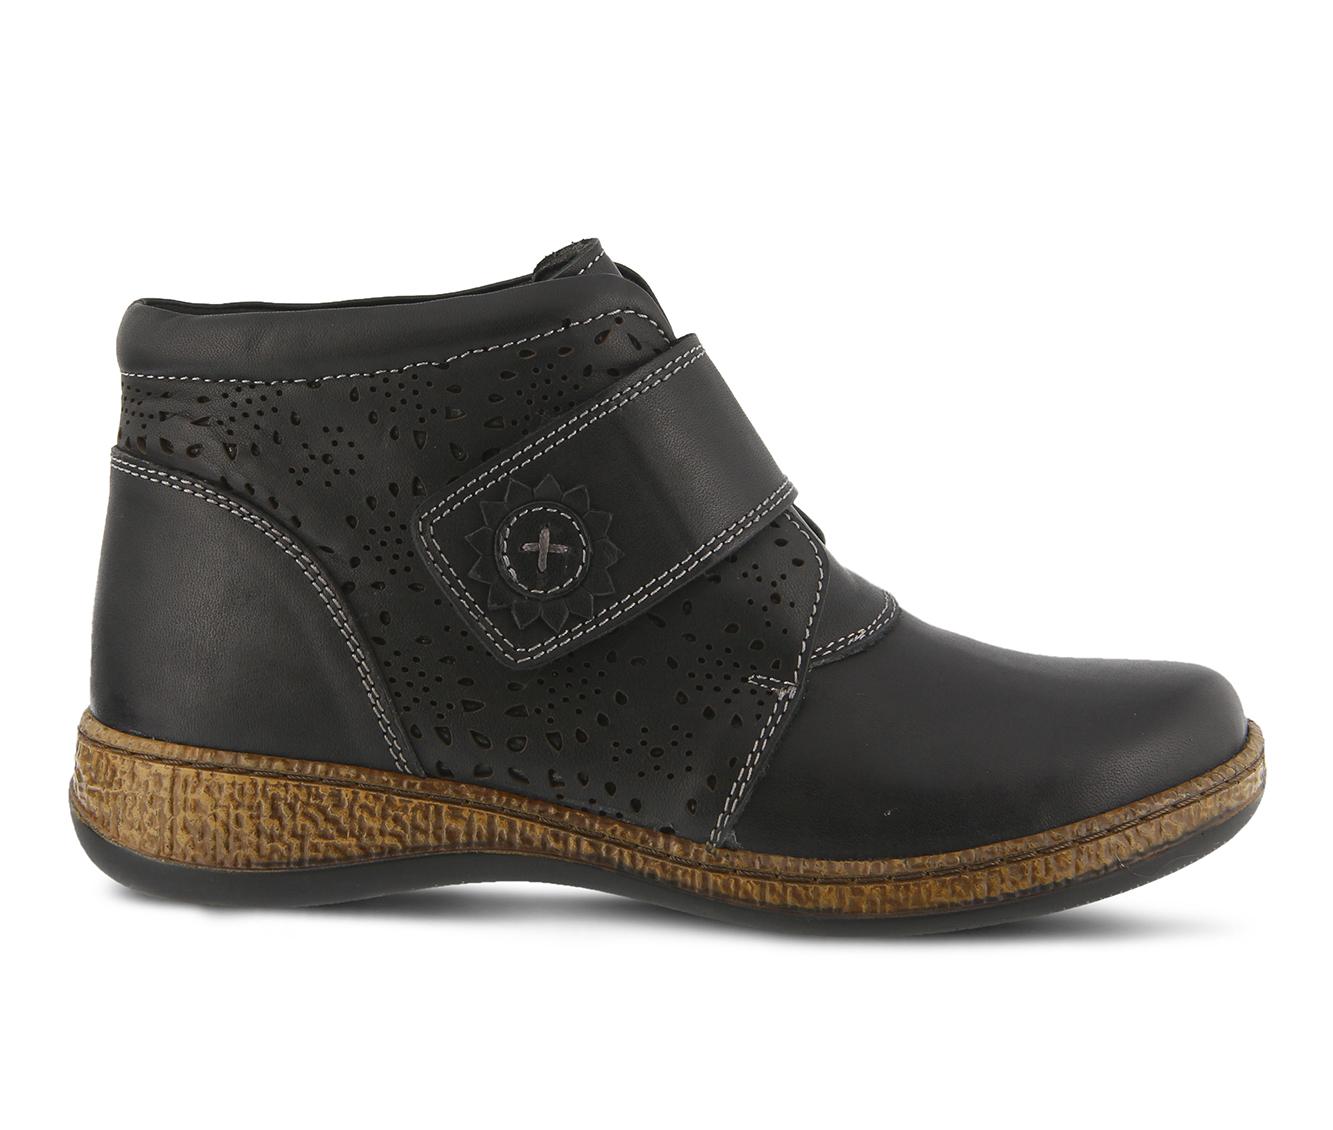 SPRING STEP Souzala Women's Boots (Black Leather)